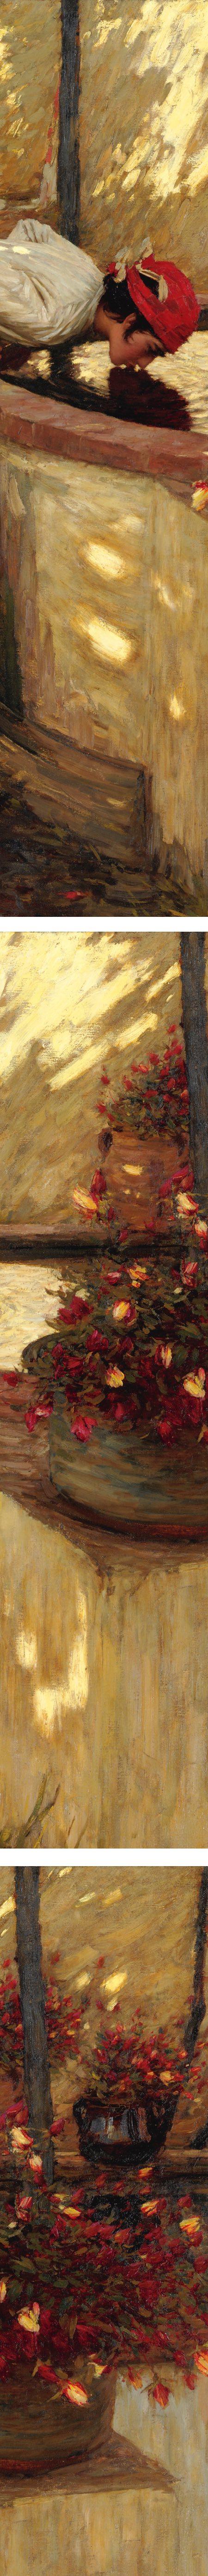 Ligurian Roses, Henry Herbert La Thangue (details)